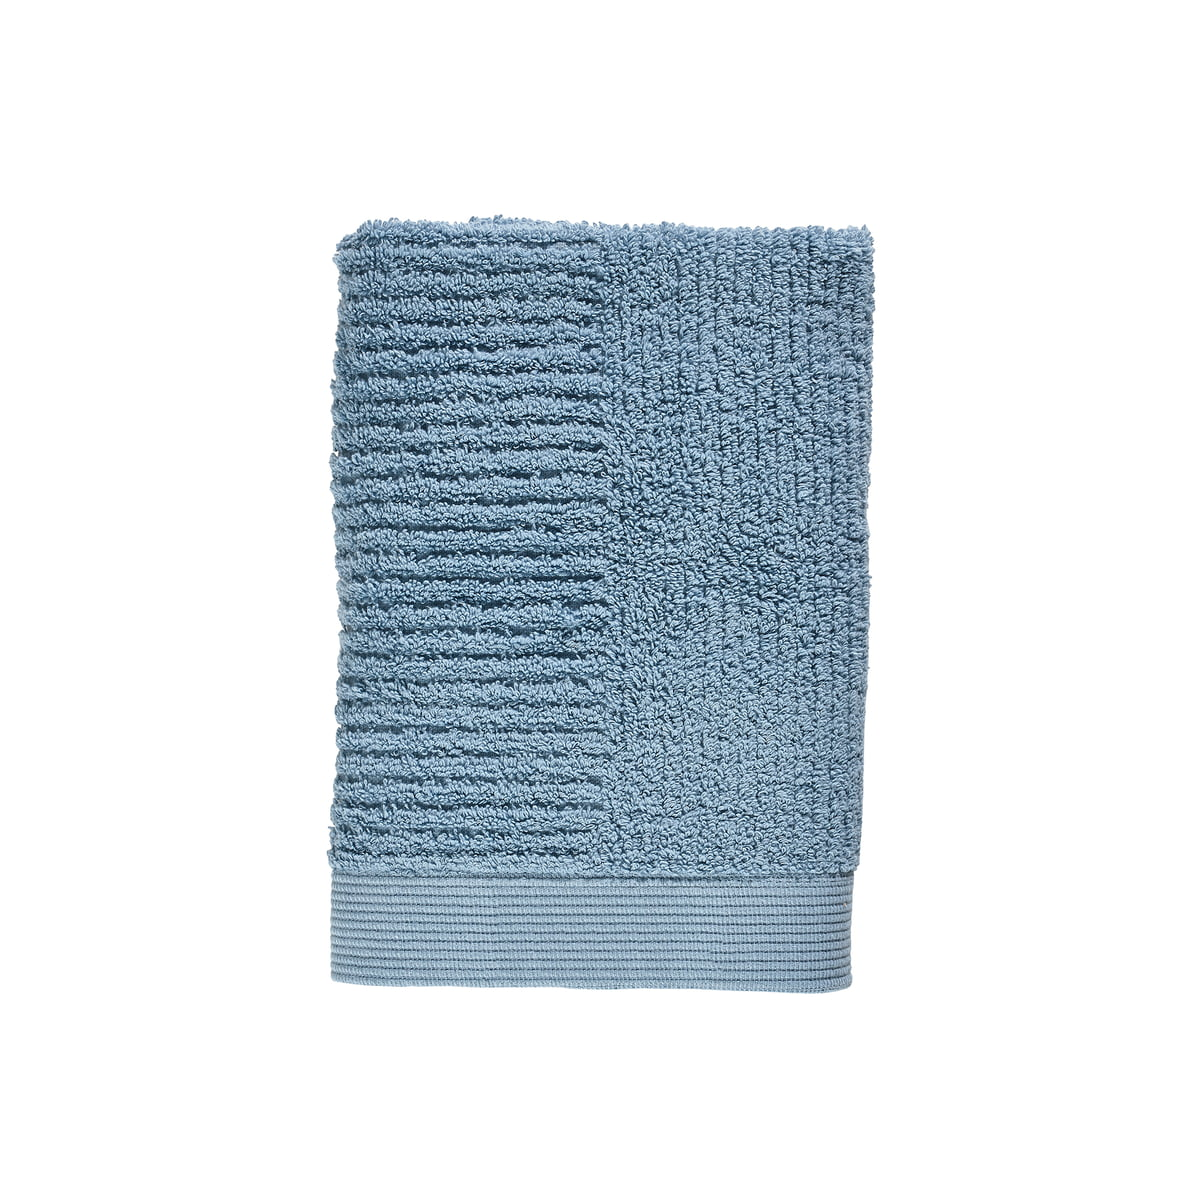 Zone Denmark - Classic Gästehandtuch, 50 x 70 cm, blue fog   Bad > Handtücher > Gästehandtücher   Zone Denmark